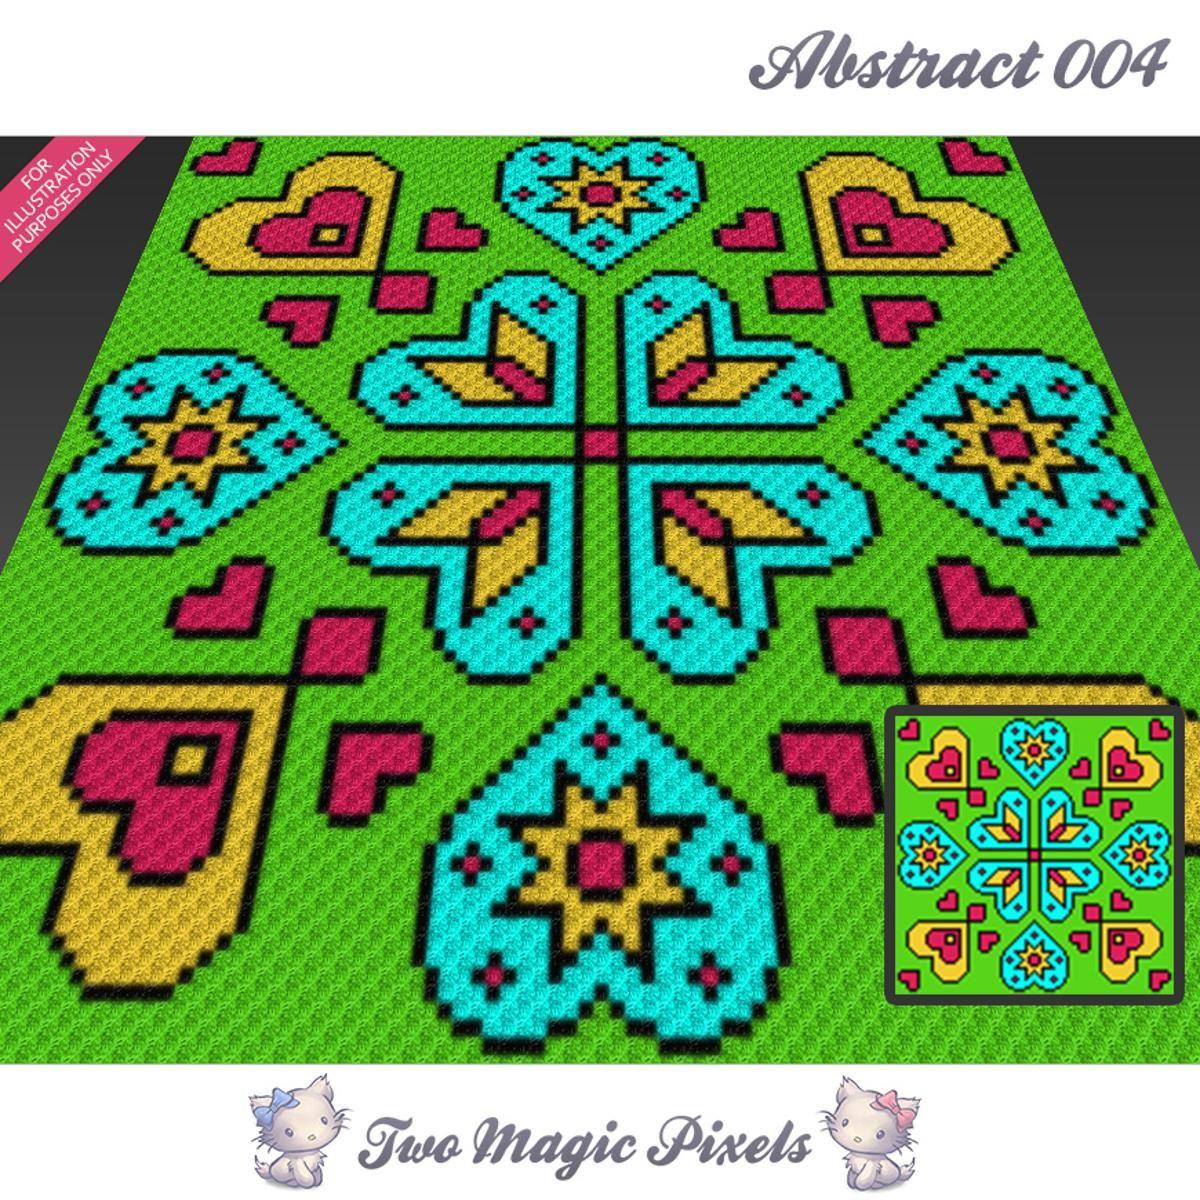 Abstract 004 C2C Crochet Graph   Tejido